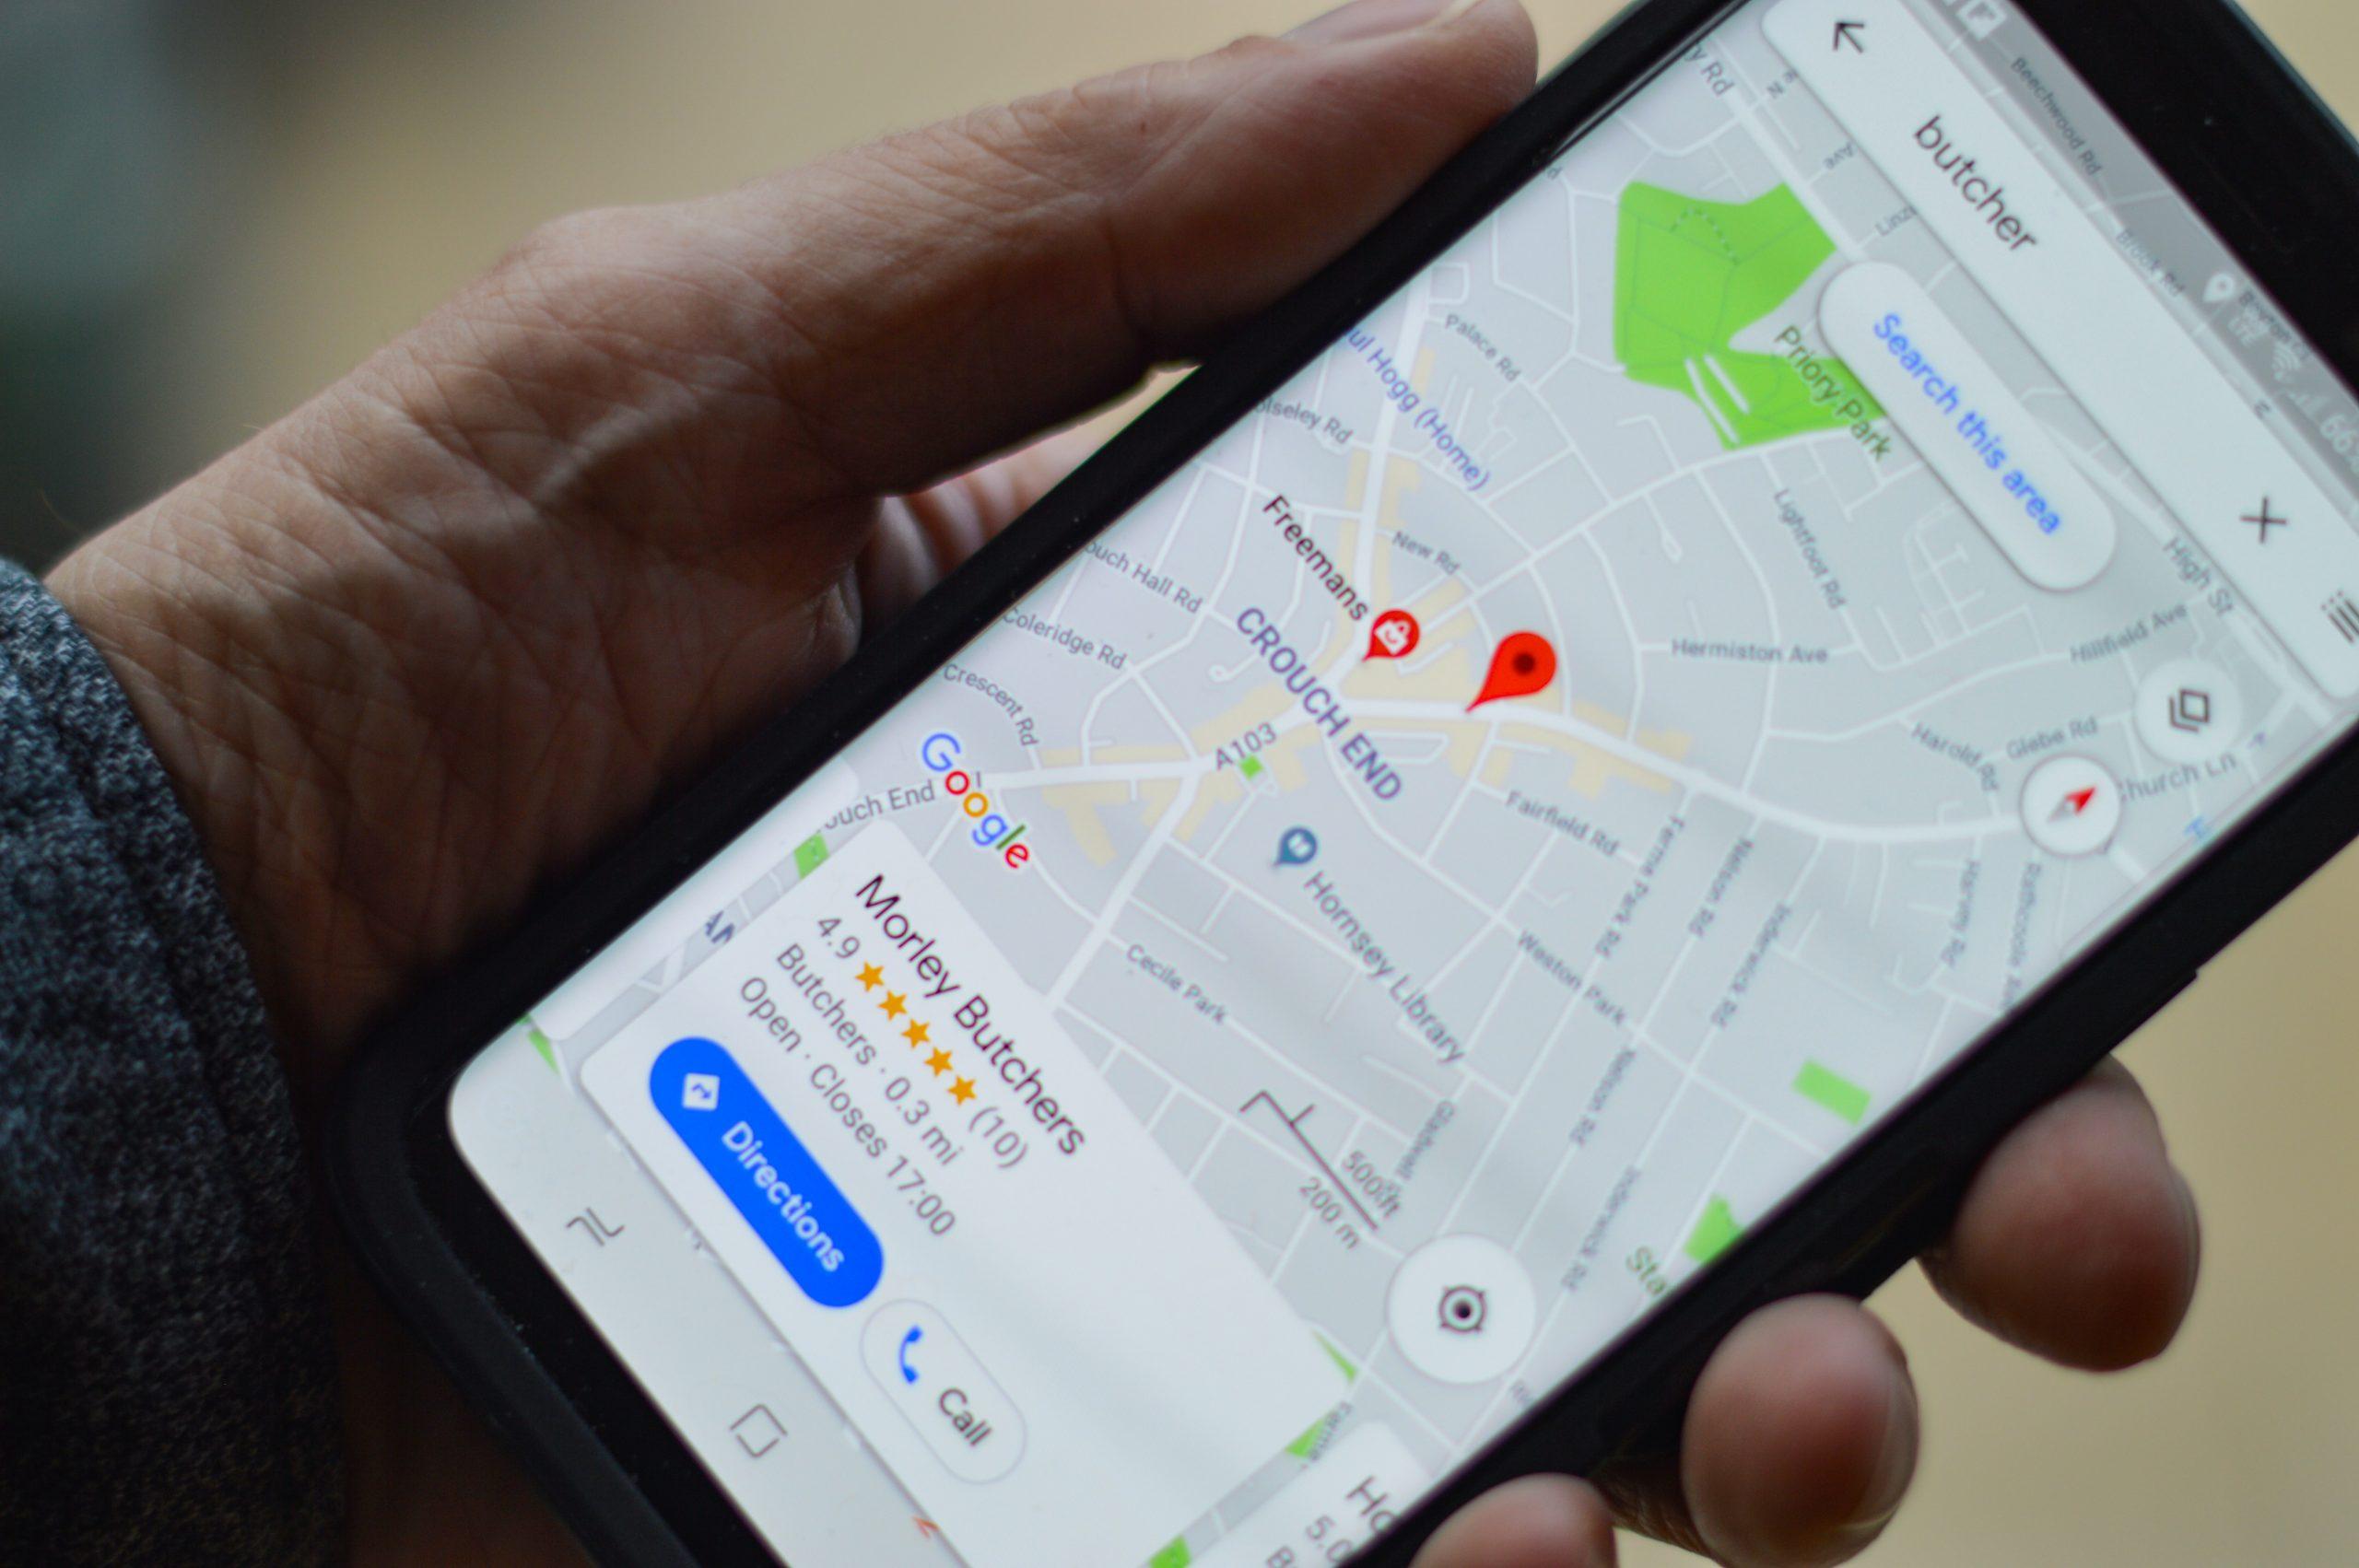 Usuario utilizando Google Maps